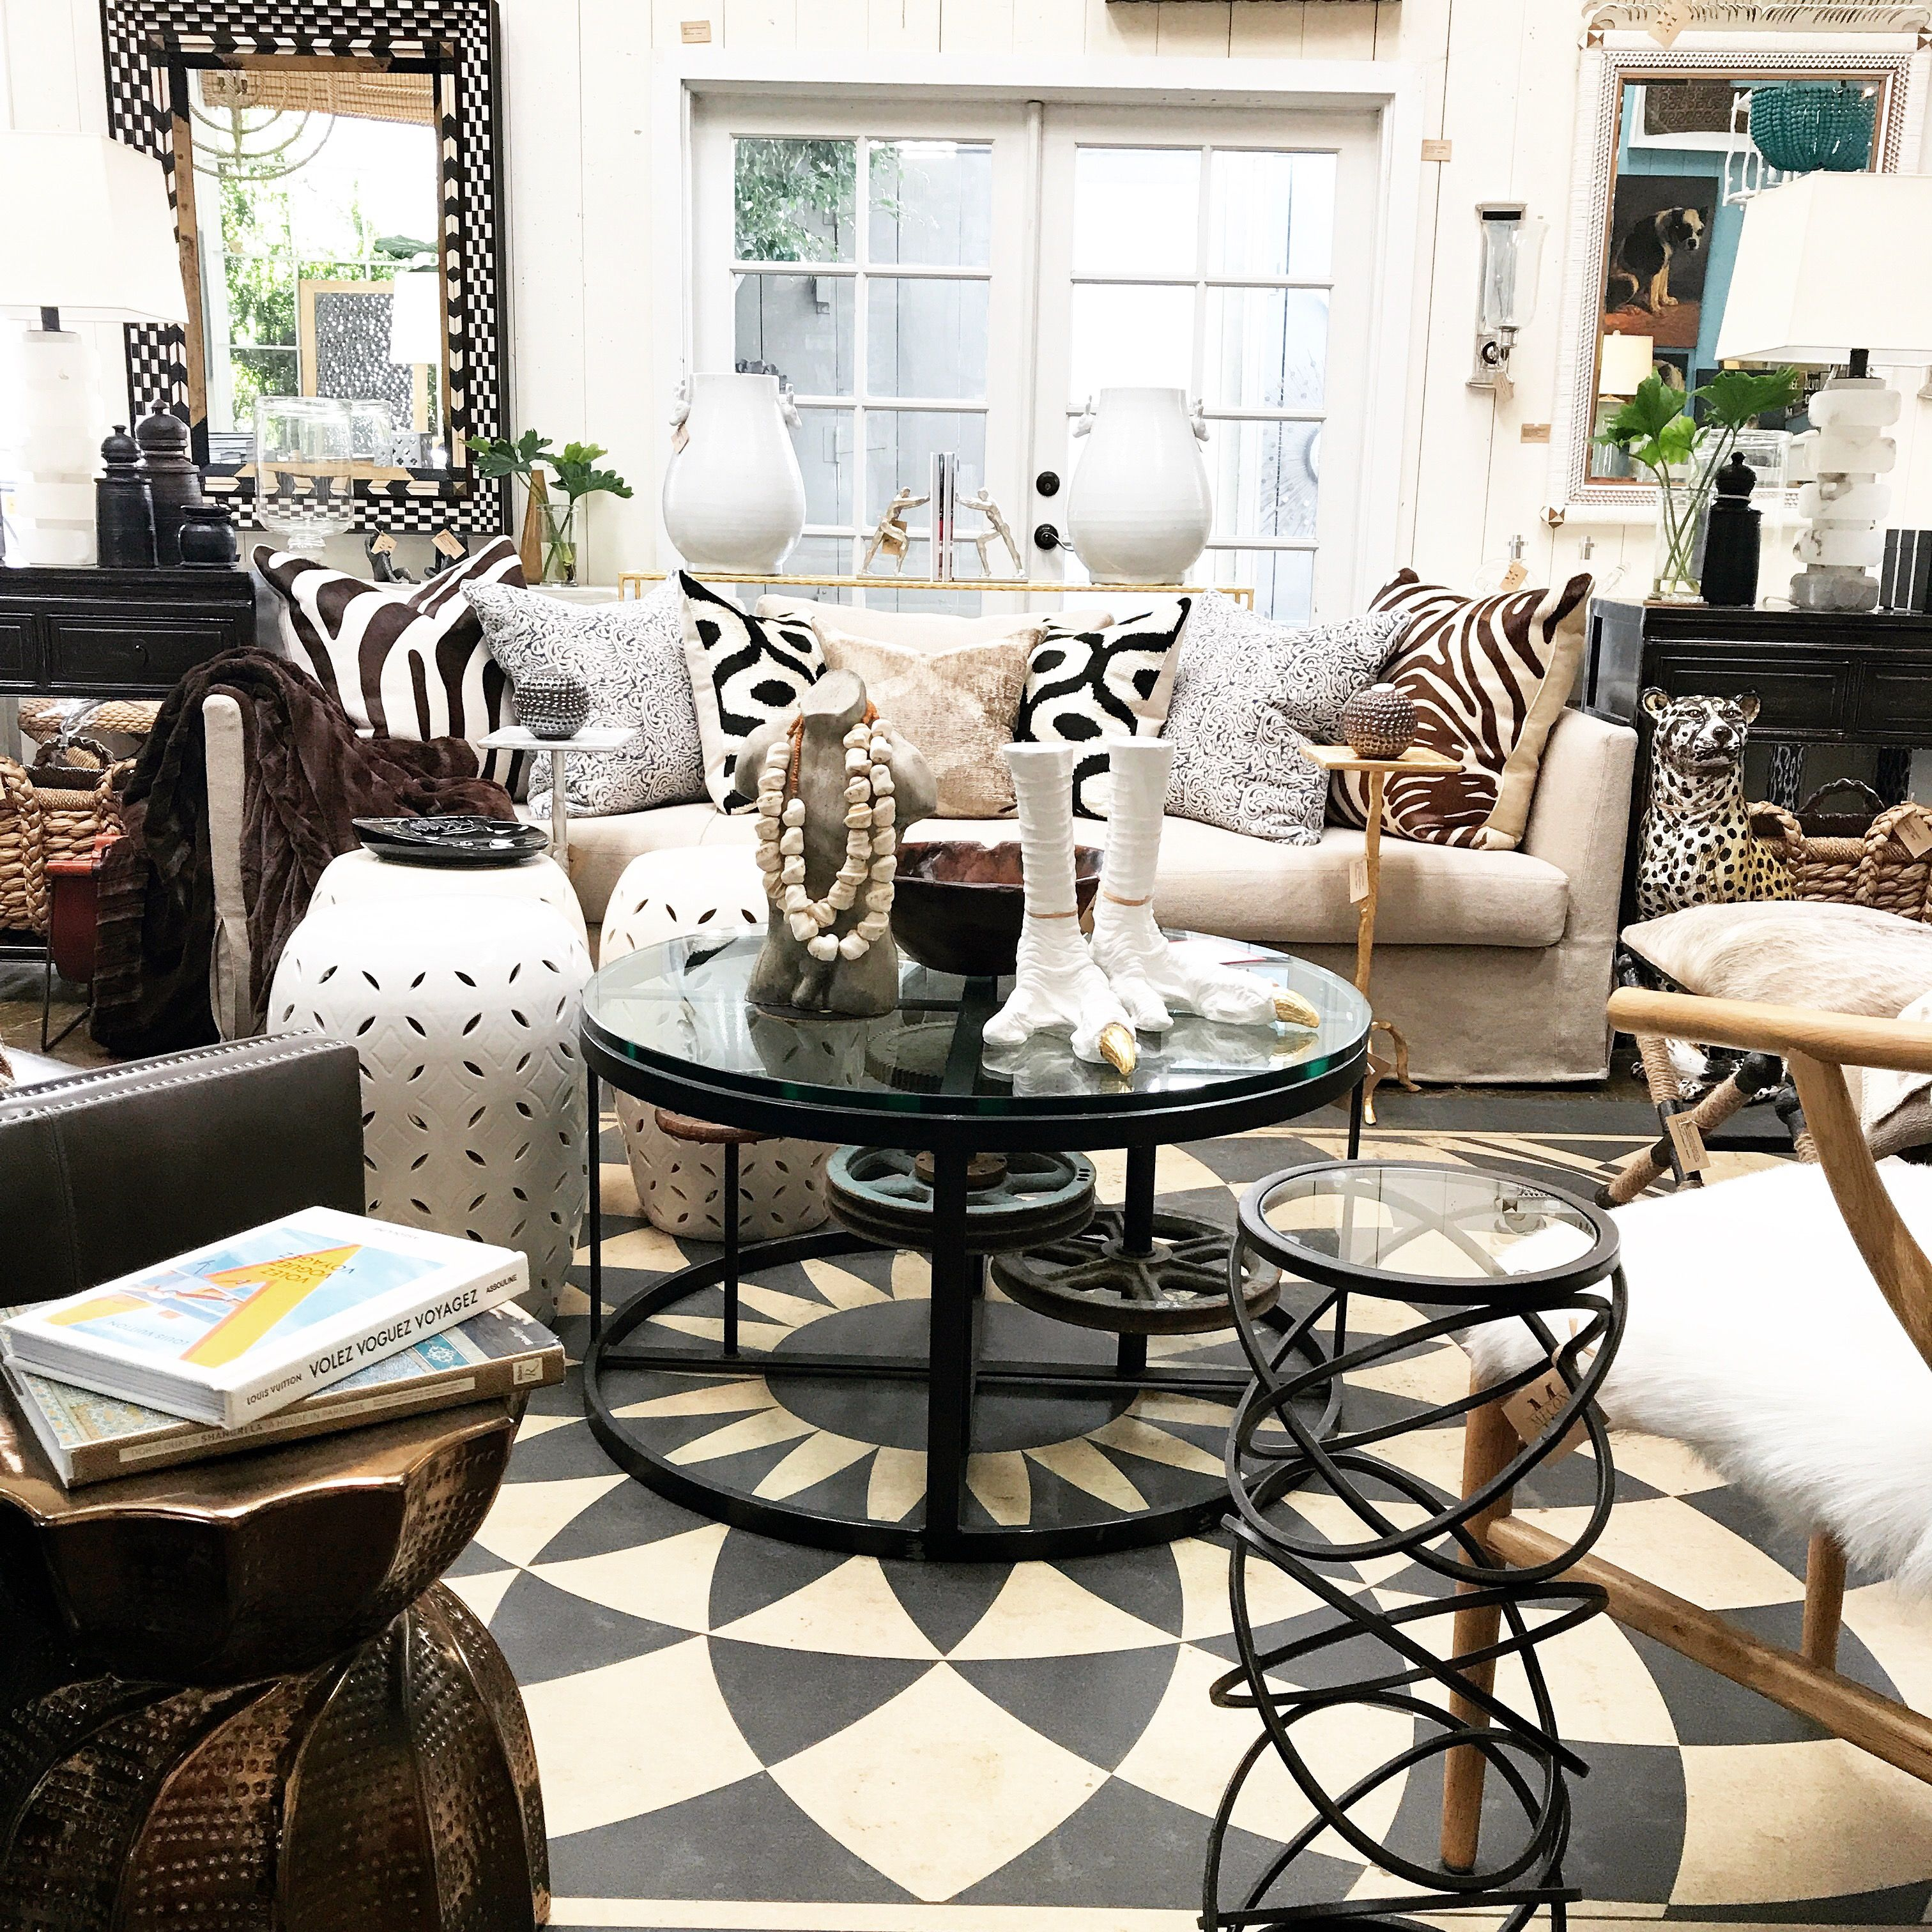 Geometric and animal print accents at mecox la interiordesign home decor design also rh pinterest